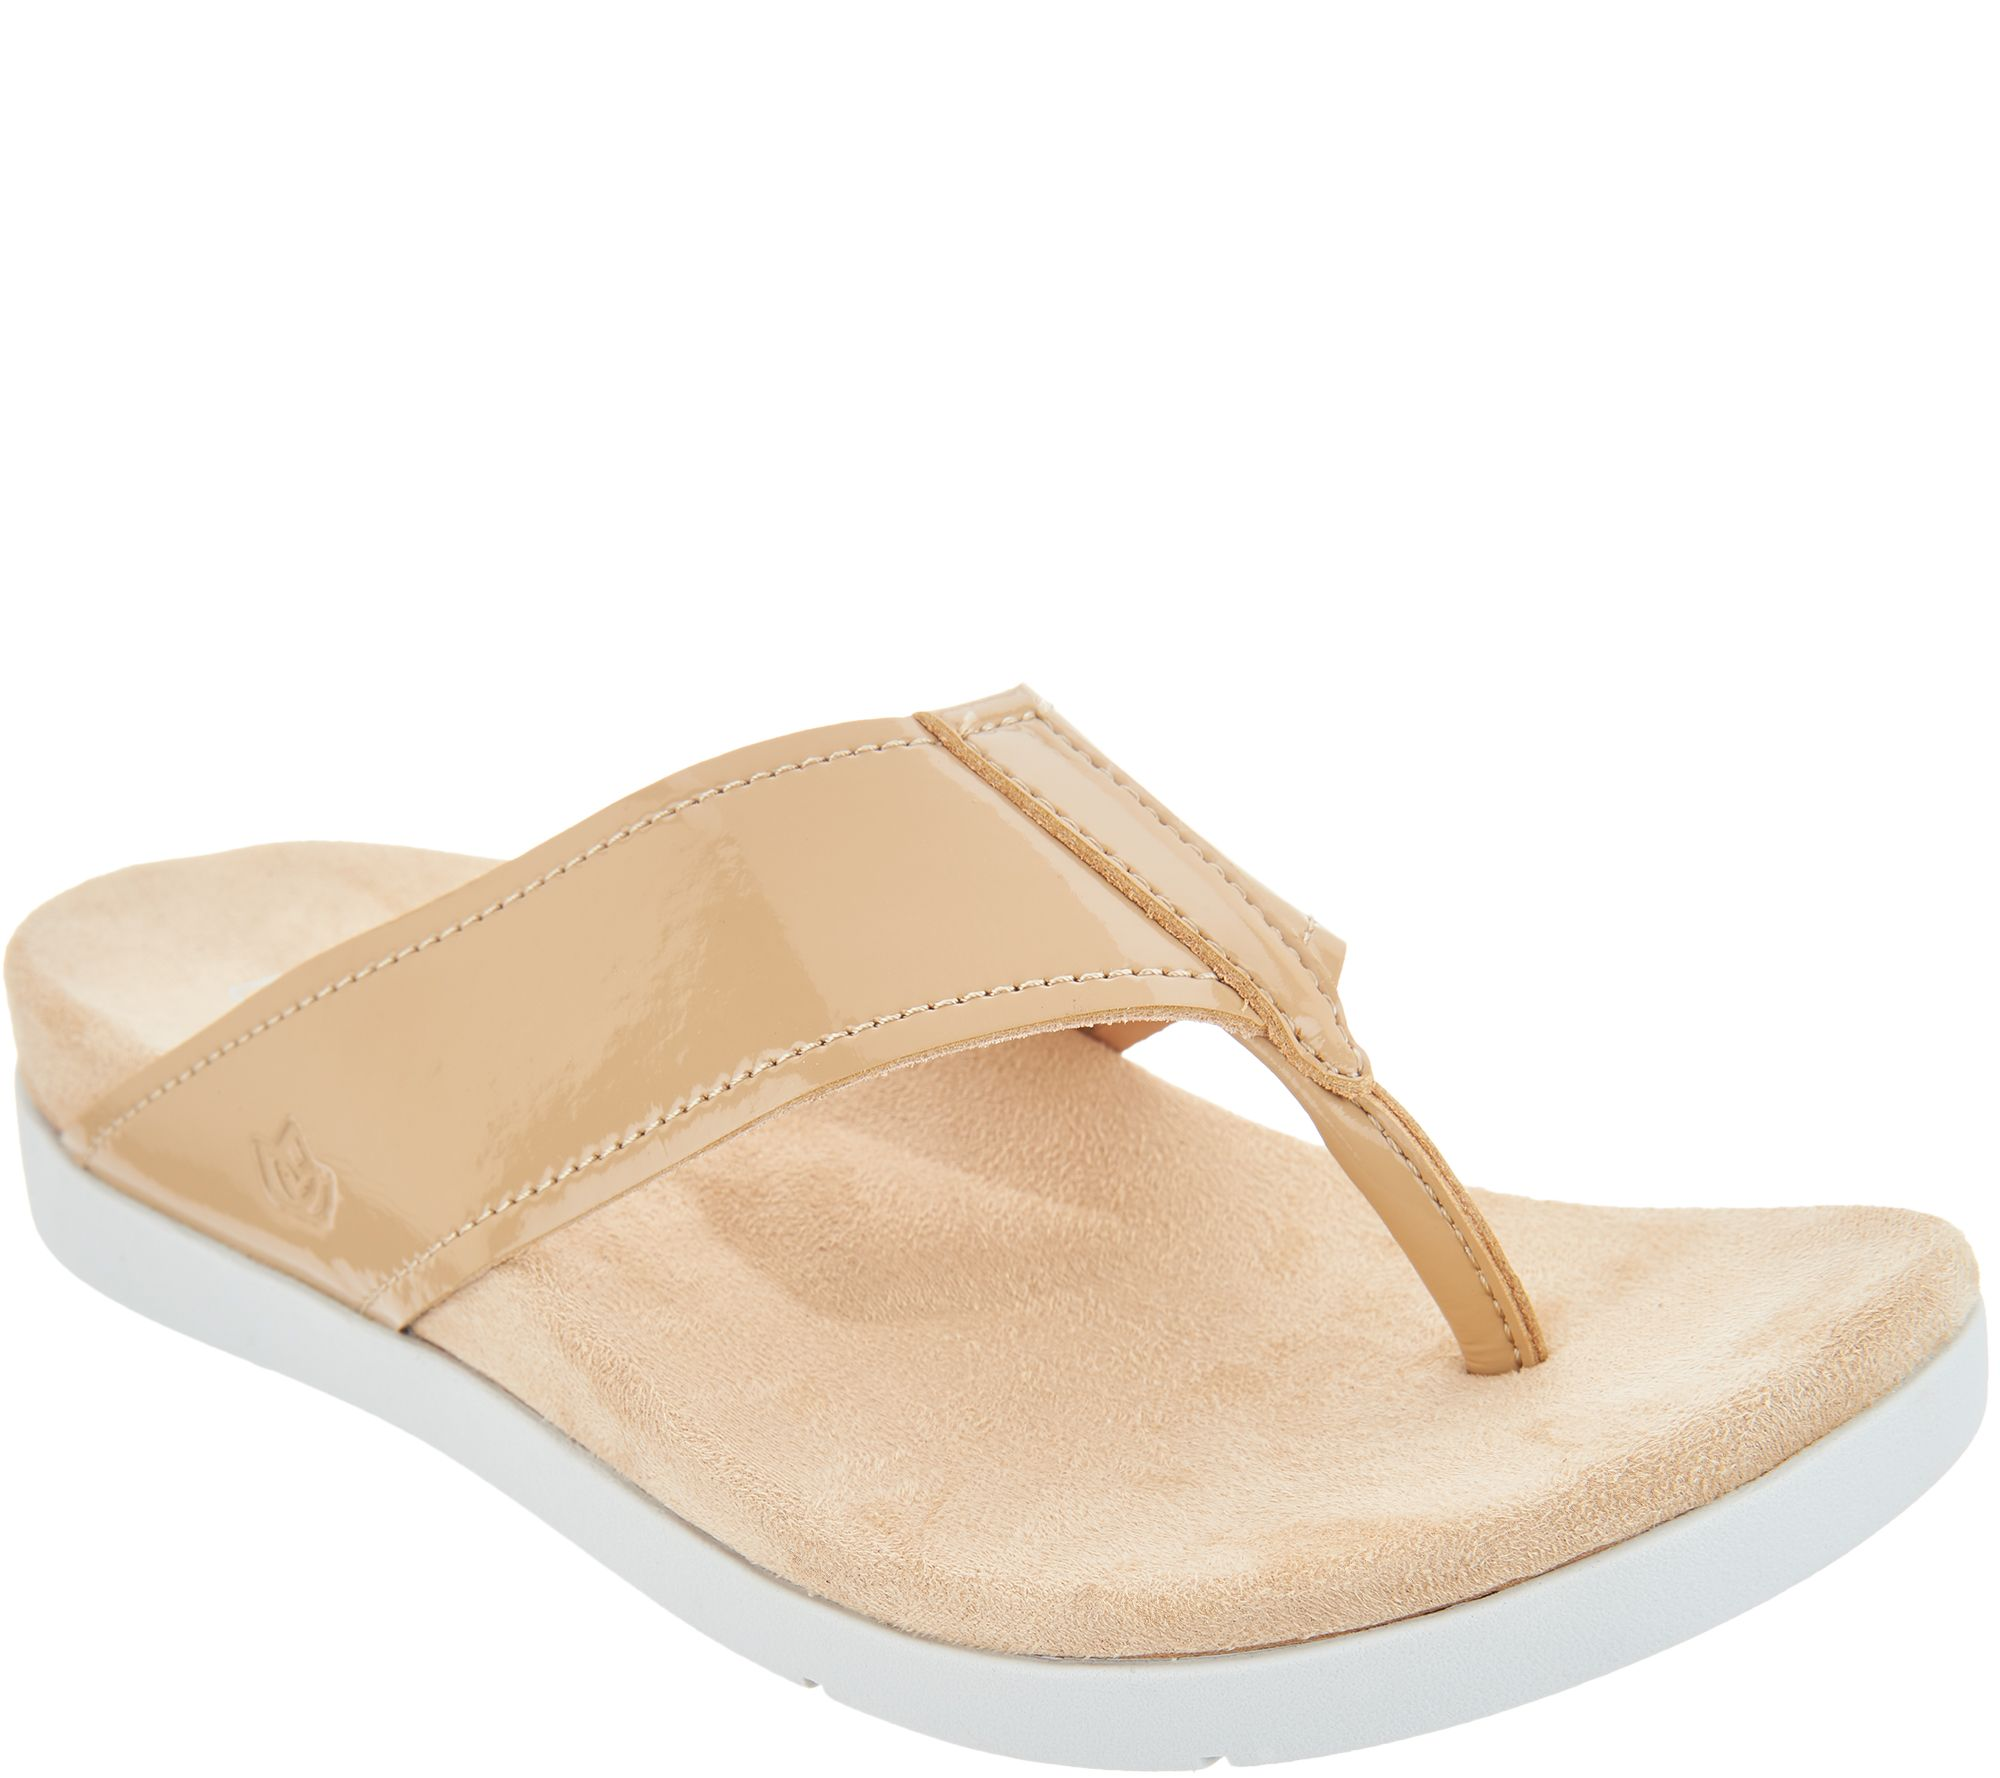 e2bbb0d61bfe0 Spenco Orthotic Platform Thong Sandals - Hampton - Page 1 — QVC.com